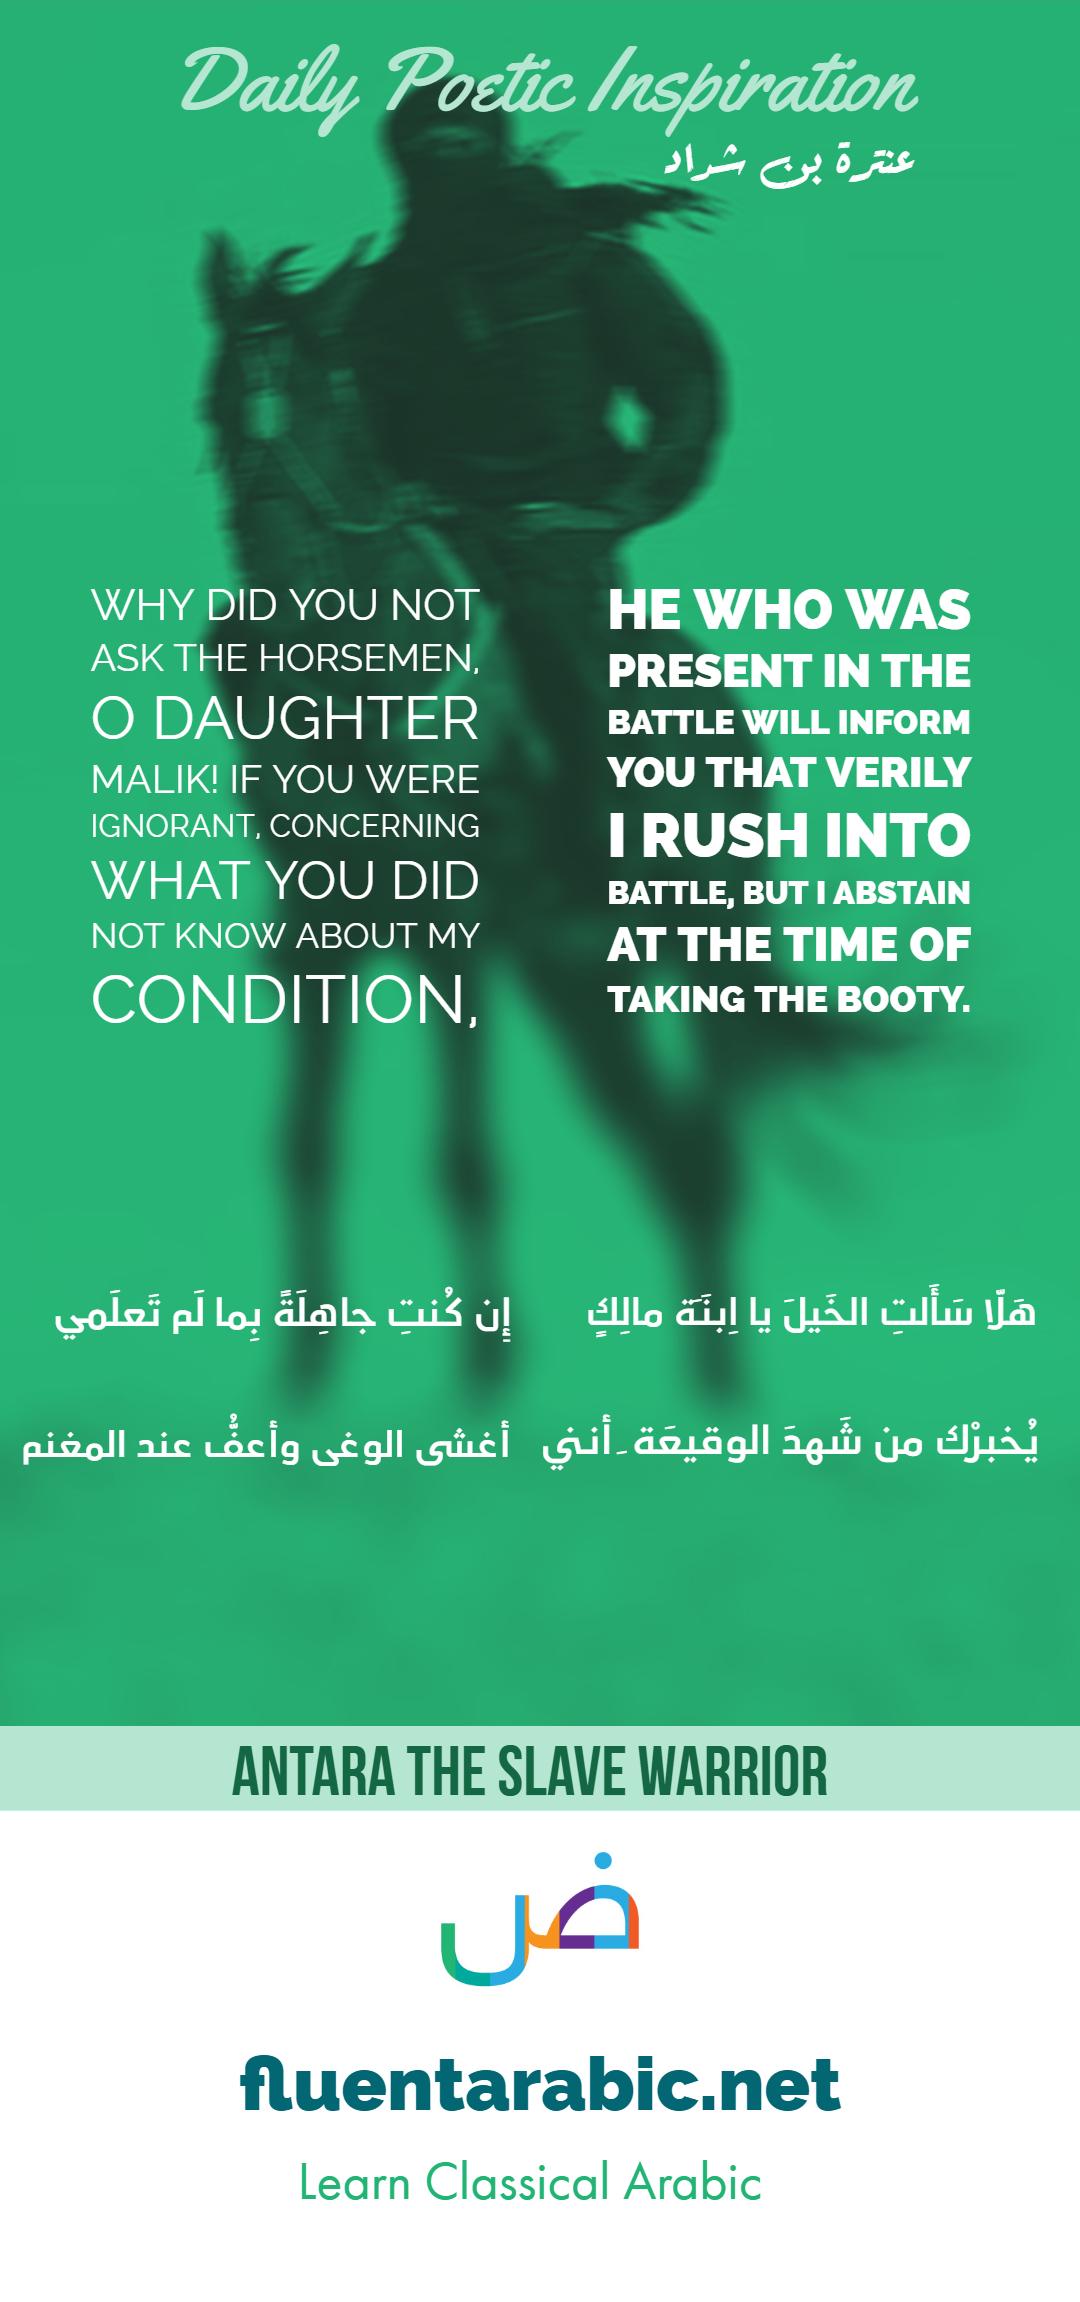 Hal la Saalti Al-Khail